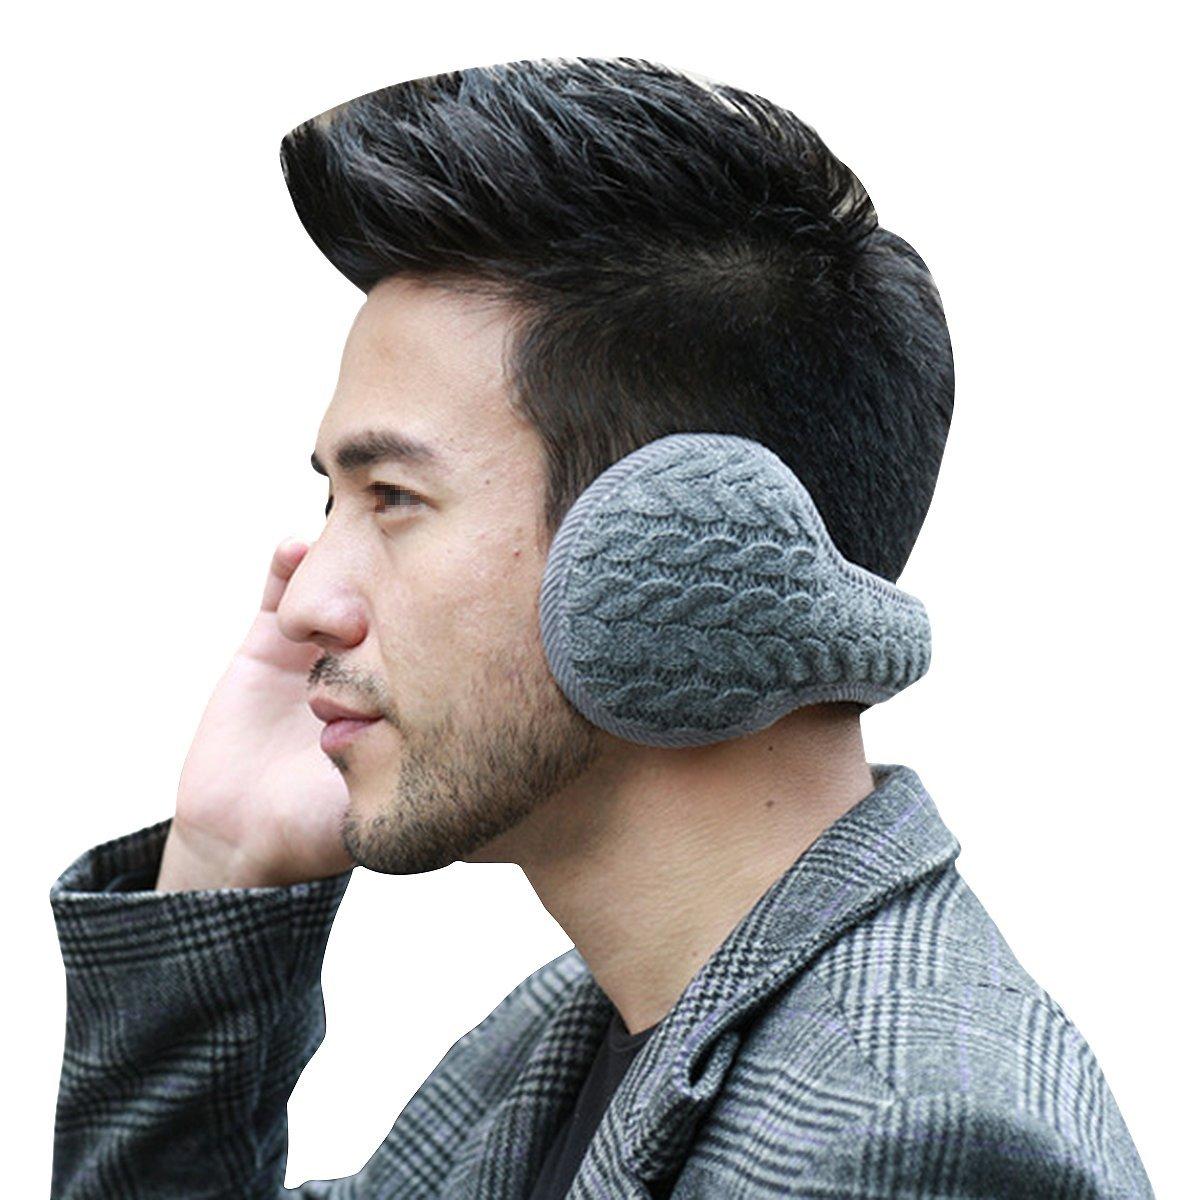 Butterme Unisex Winter Warm Knitted Ear Cover Soft Plush Earmuff for Outdoor,Ski,Party(Coffee) ZUMUii ZUMU00002404